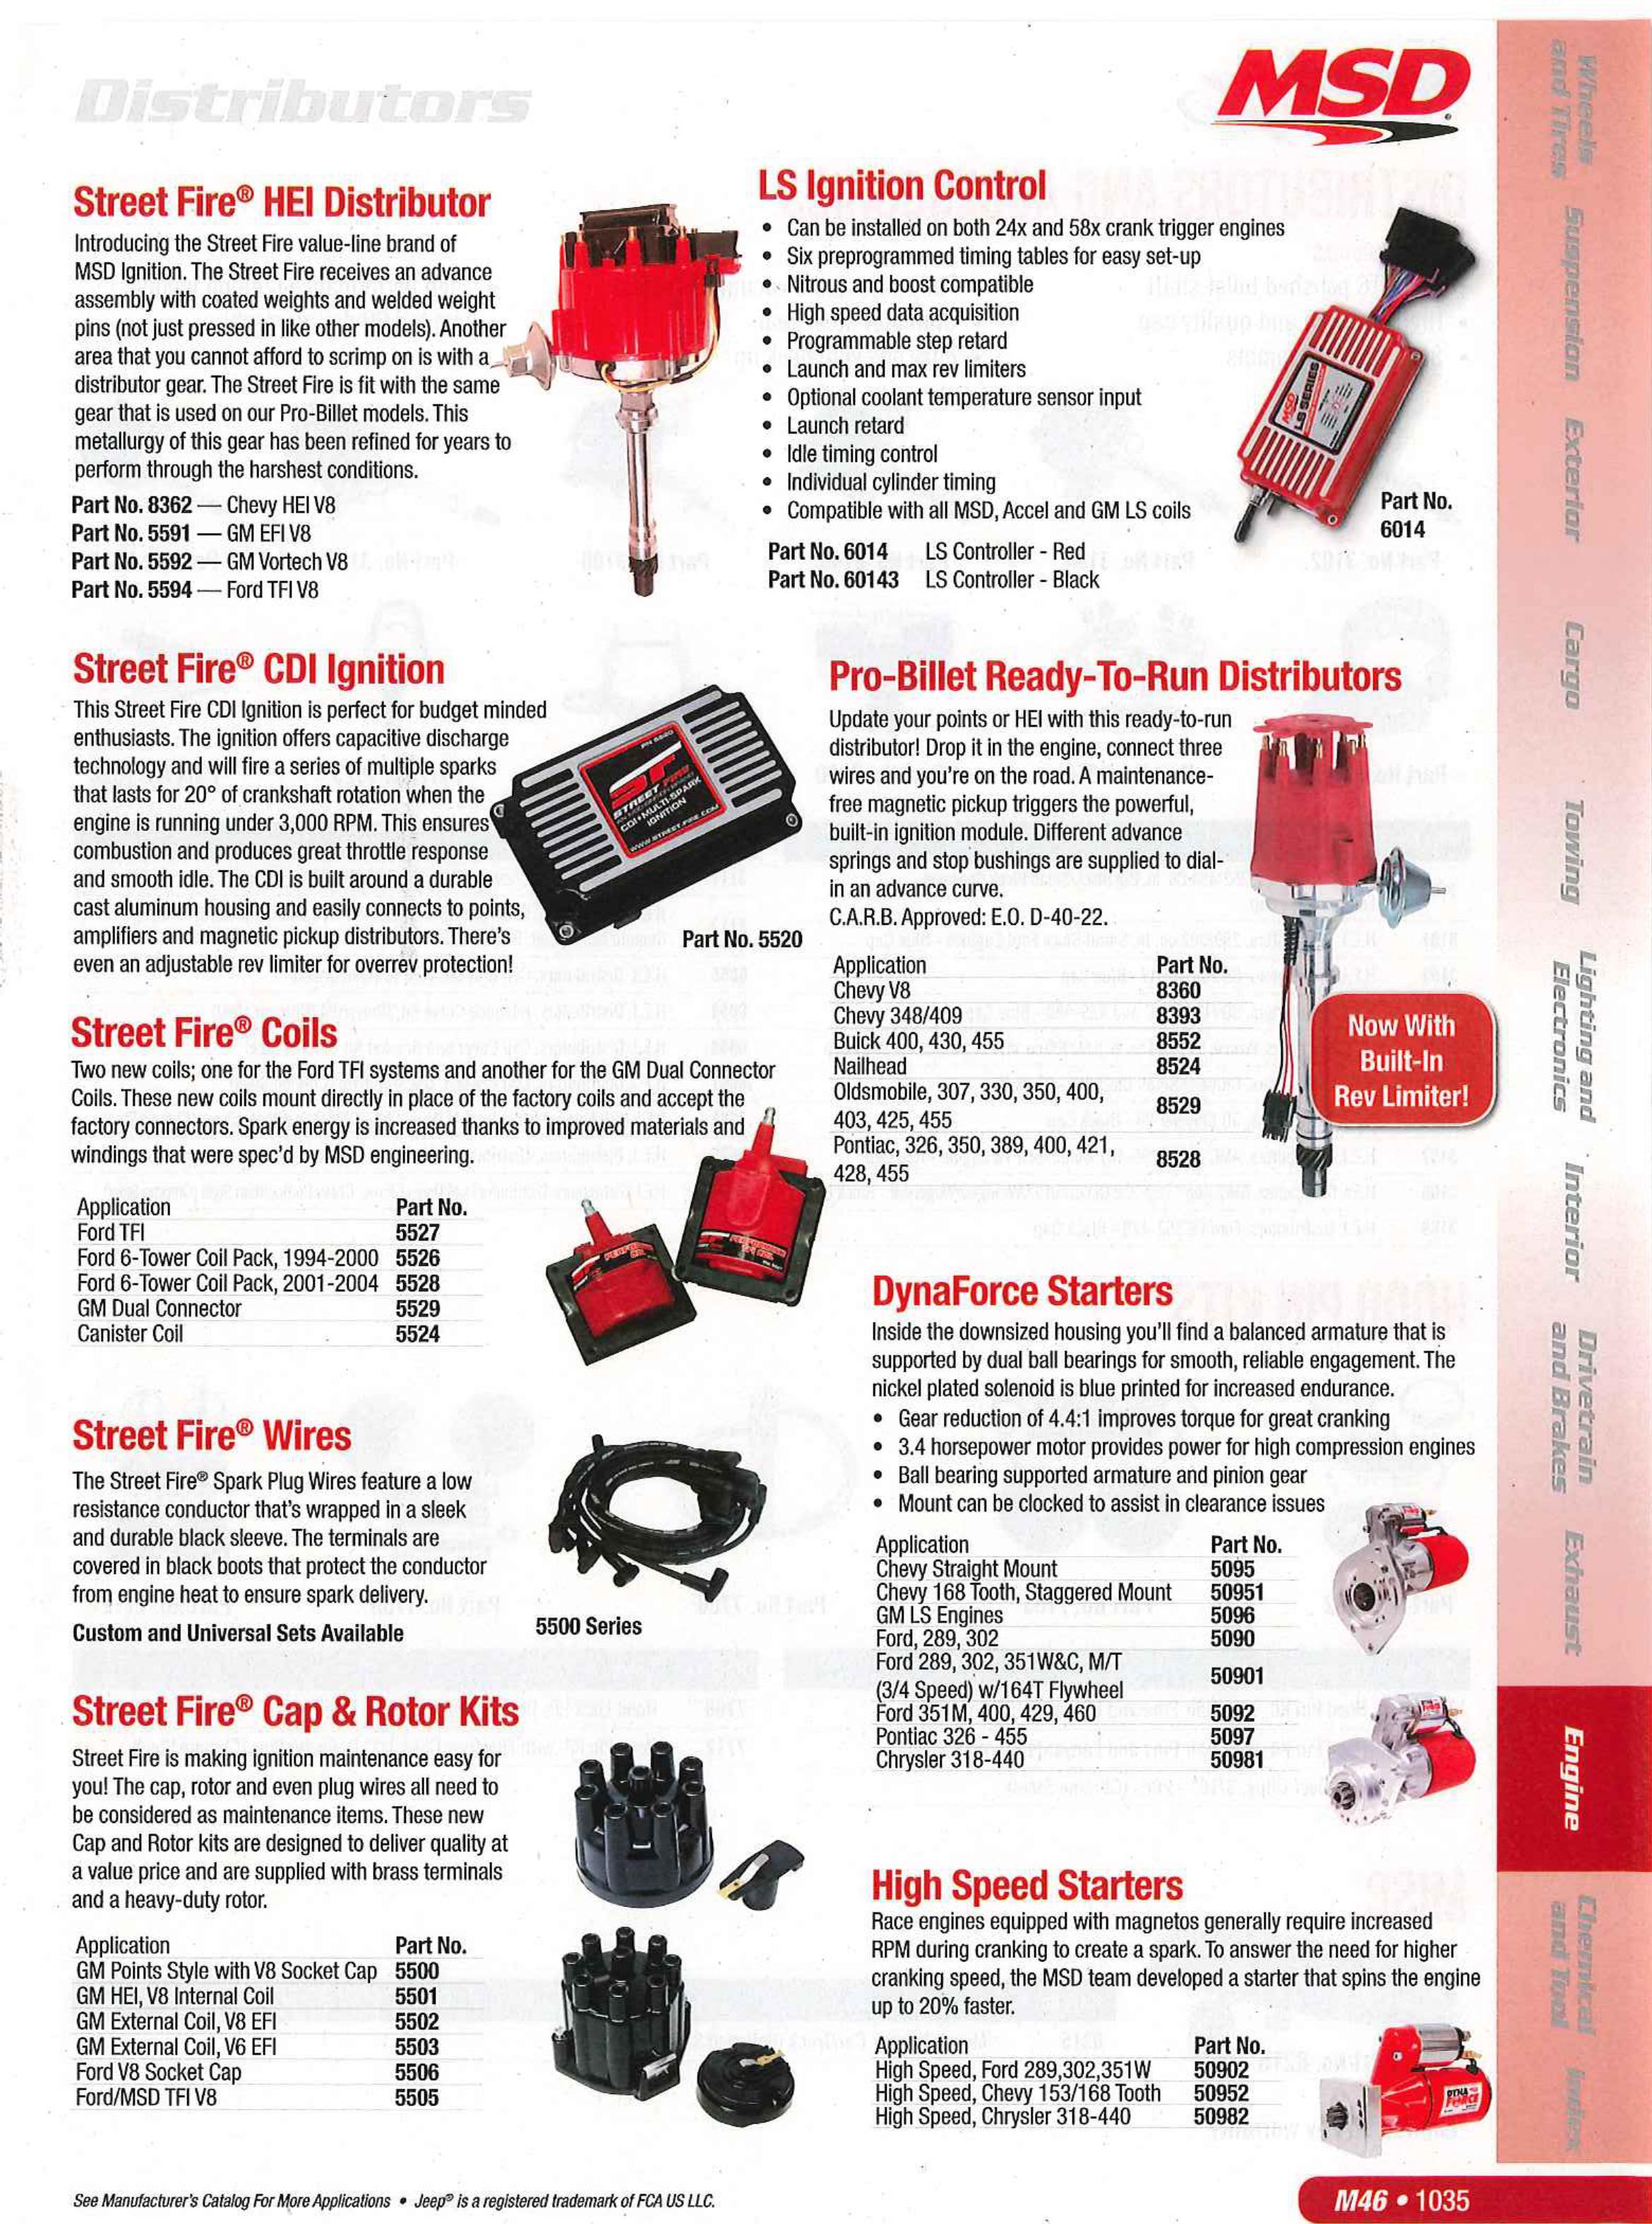 Custom Creations Truck and Car Accessories, Regina SK, Engine